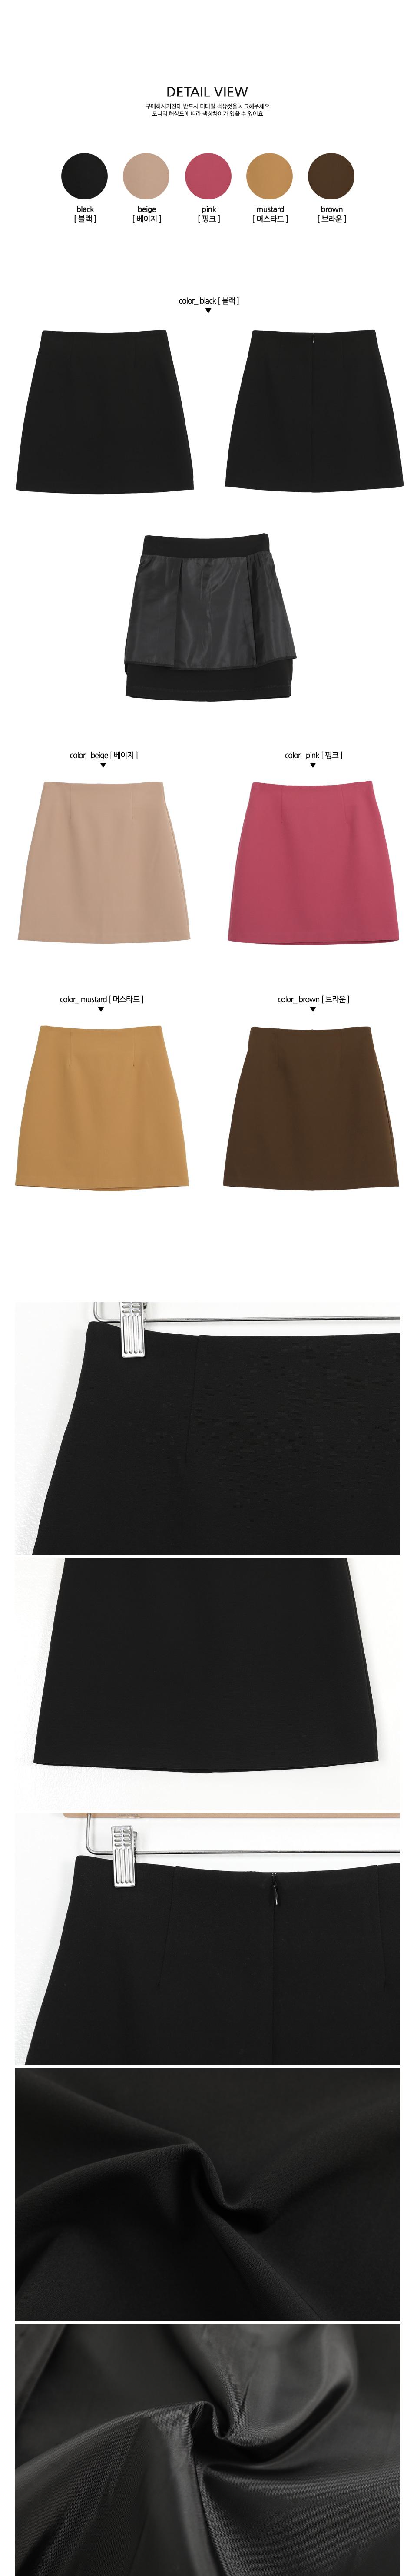 Brunch miniskirt